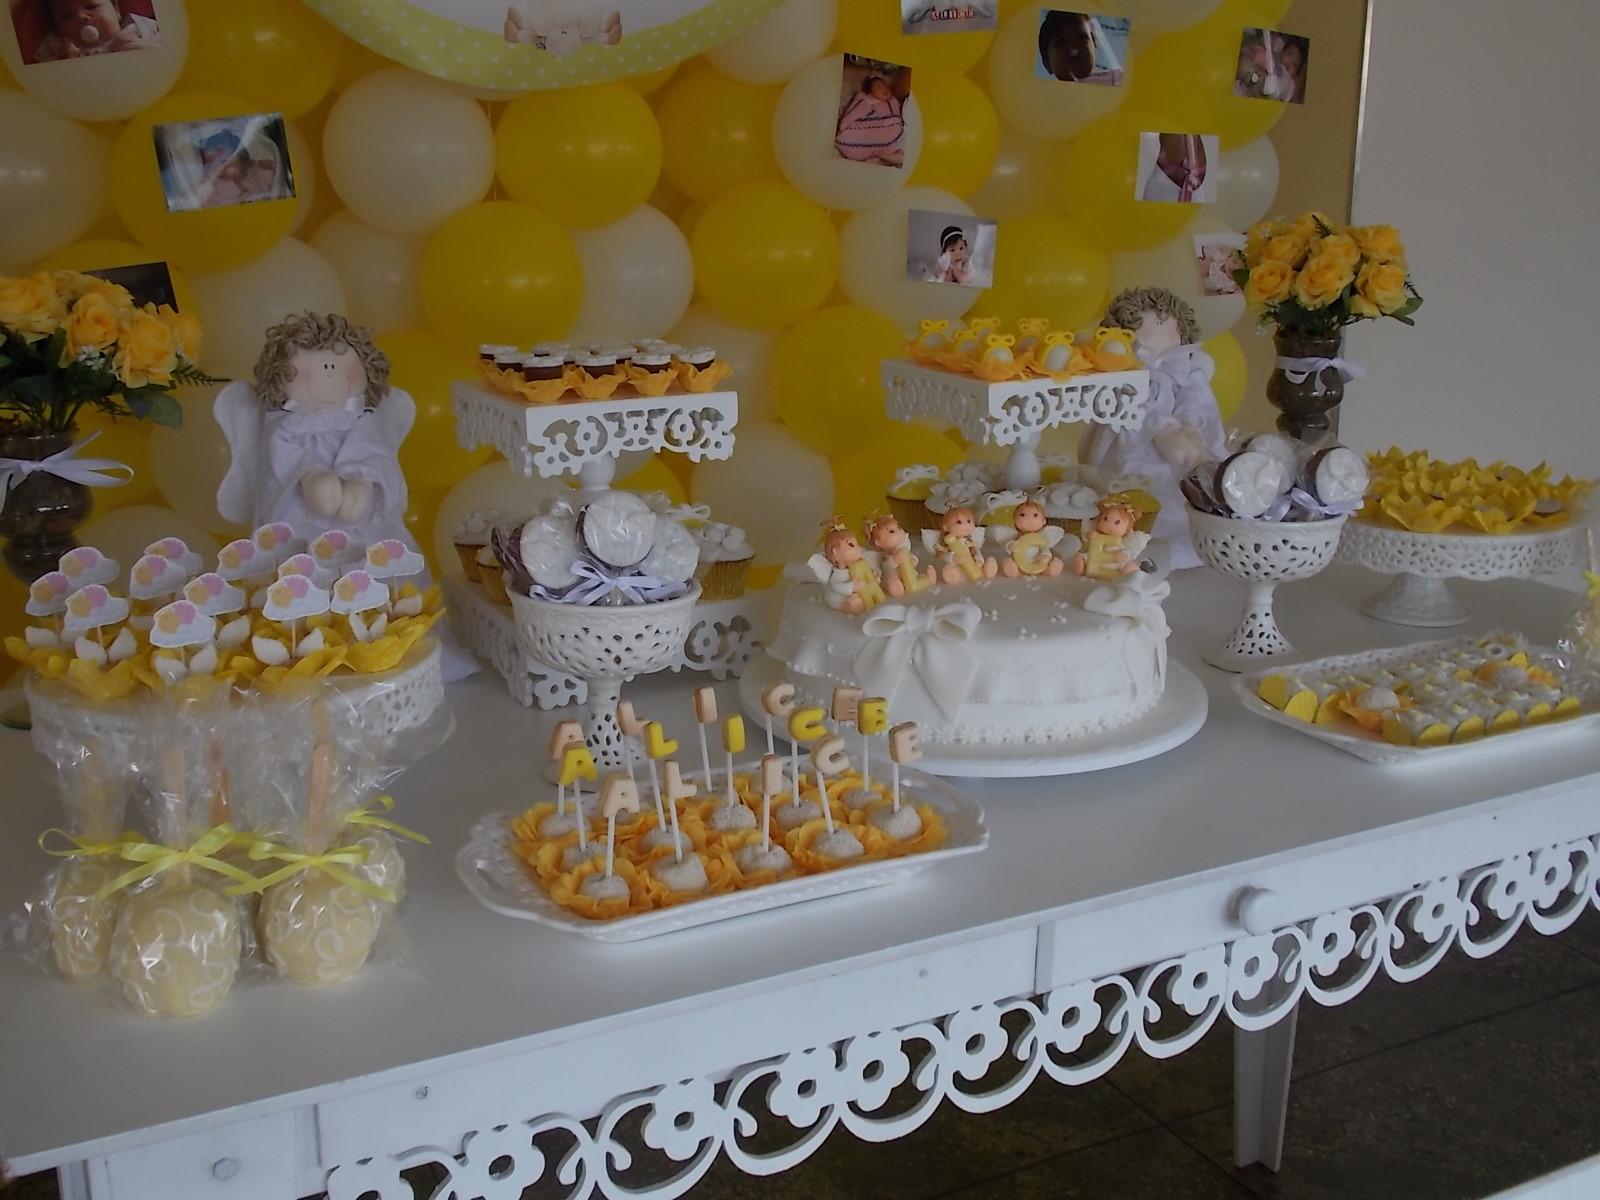 decoracao branco amarelo : decoracao branco amarelo:Batizado Amarelo e Branco Decoração Batizado Amarelo e Branco